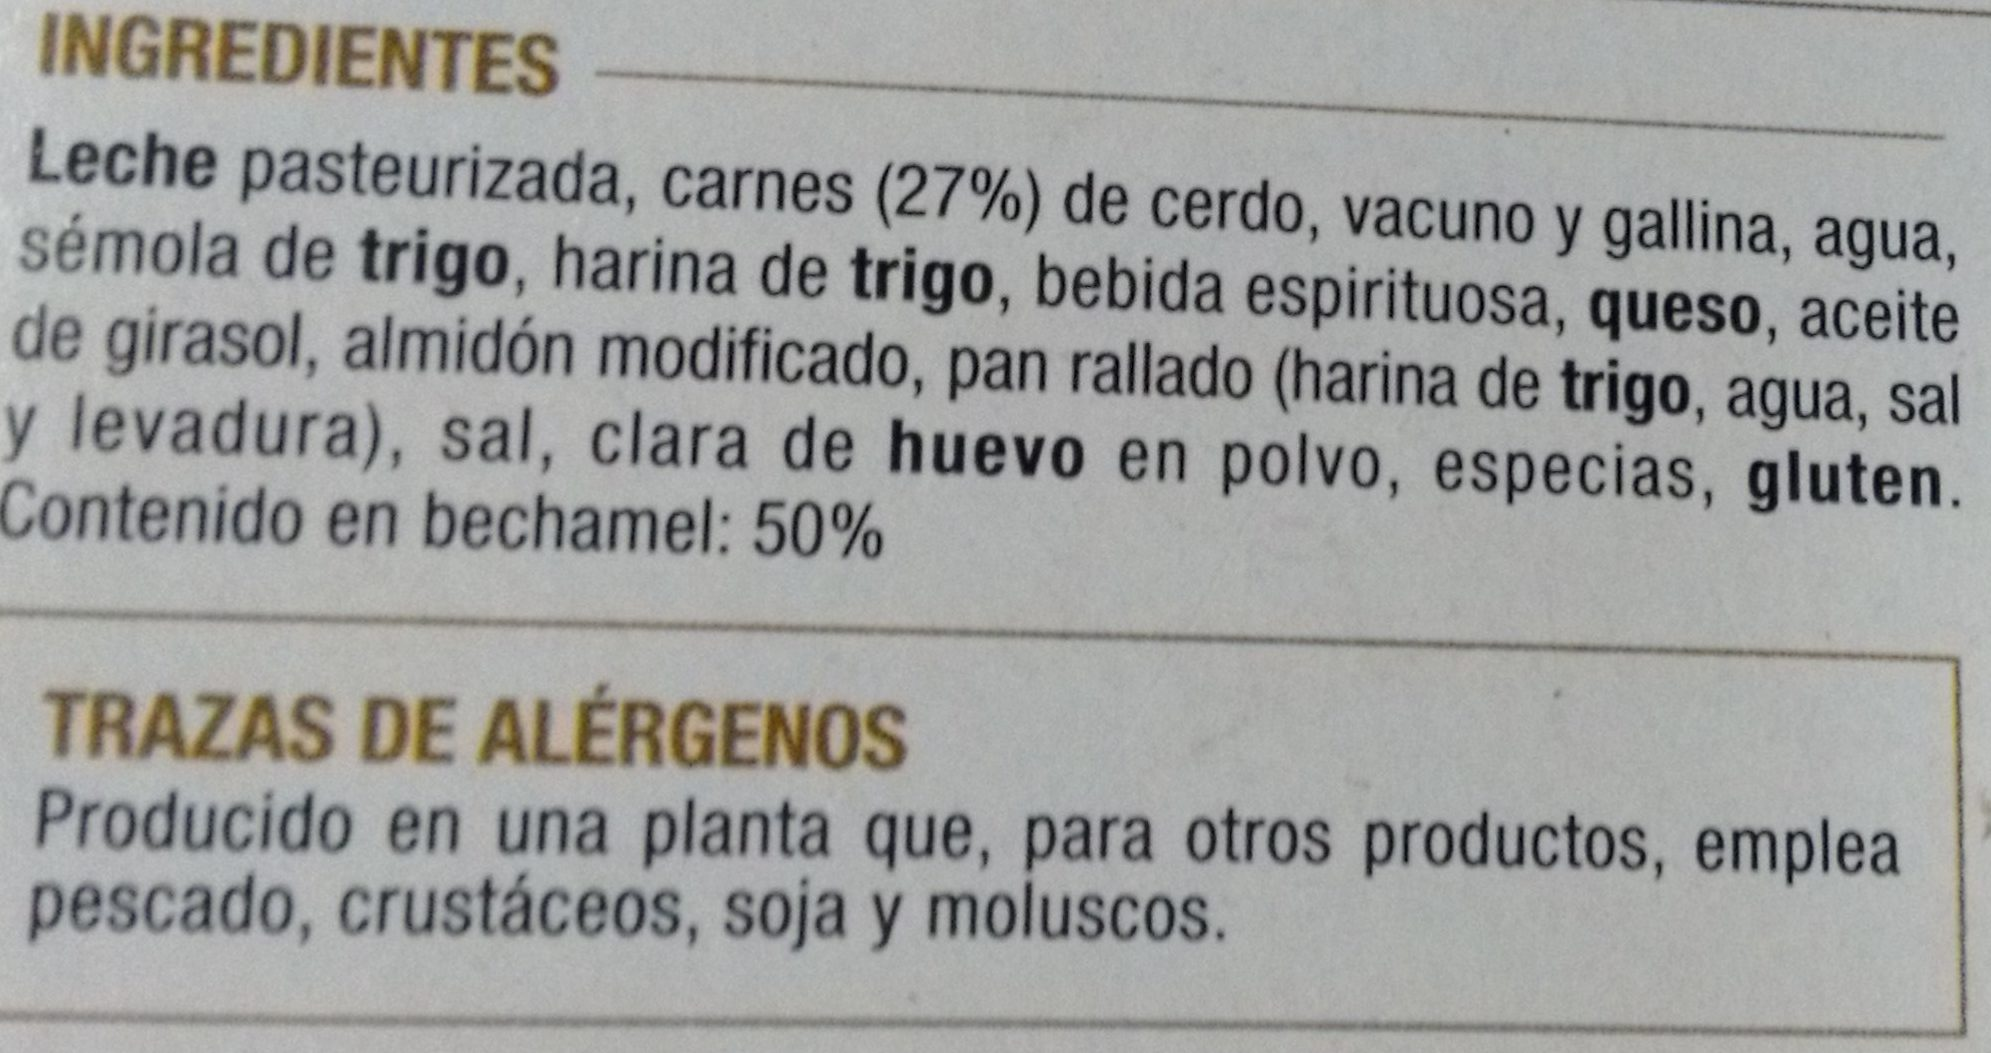 Canelones de Carne con Bechamel - Ingredientes - es